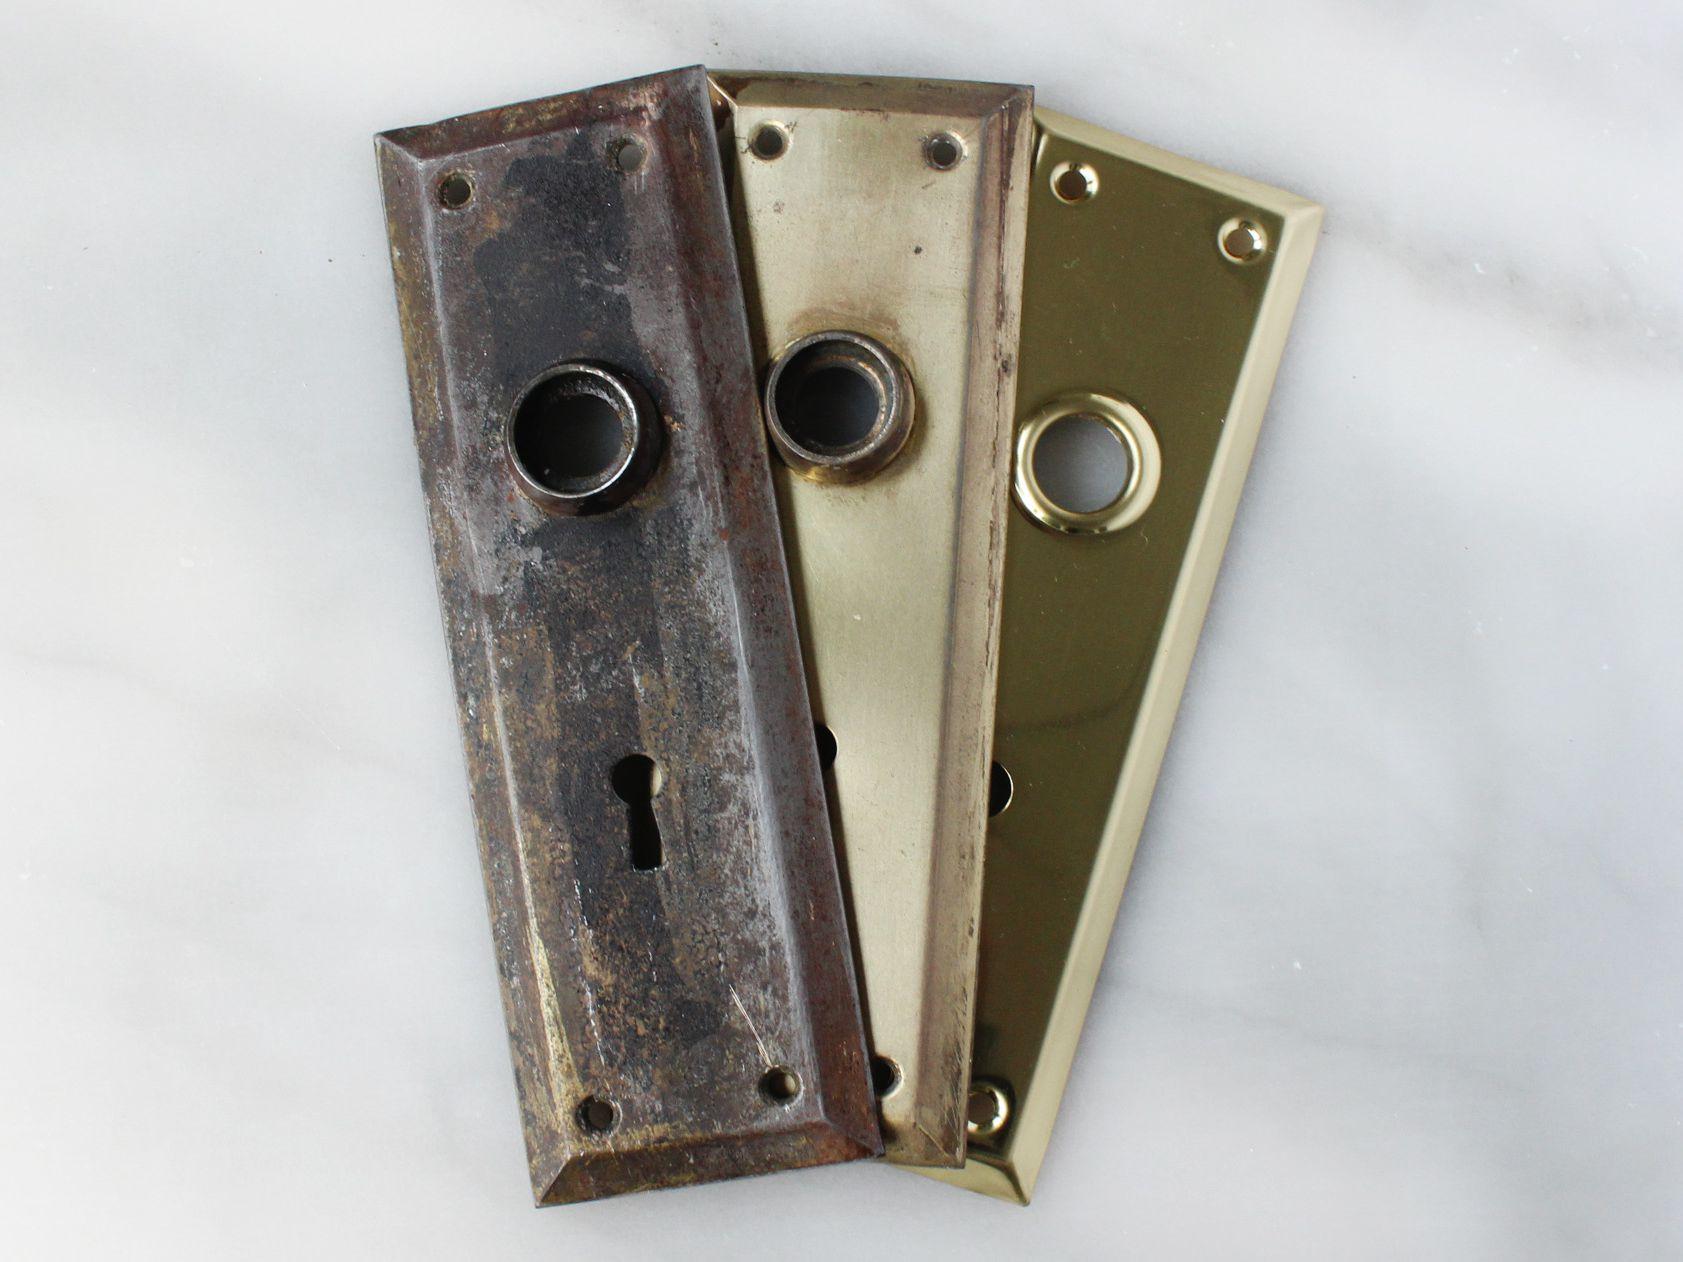 How Long To Soak Rusty Metal In Vinegar